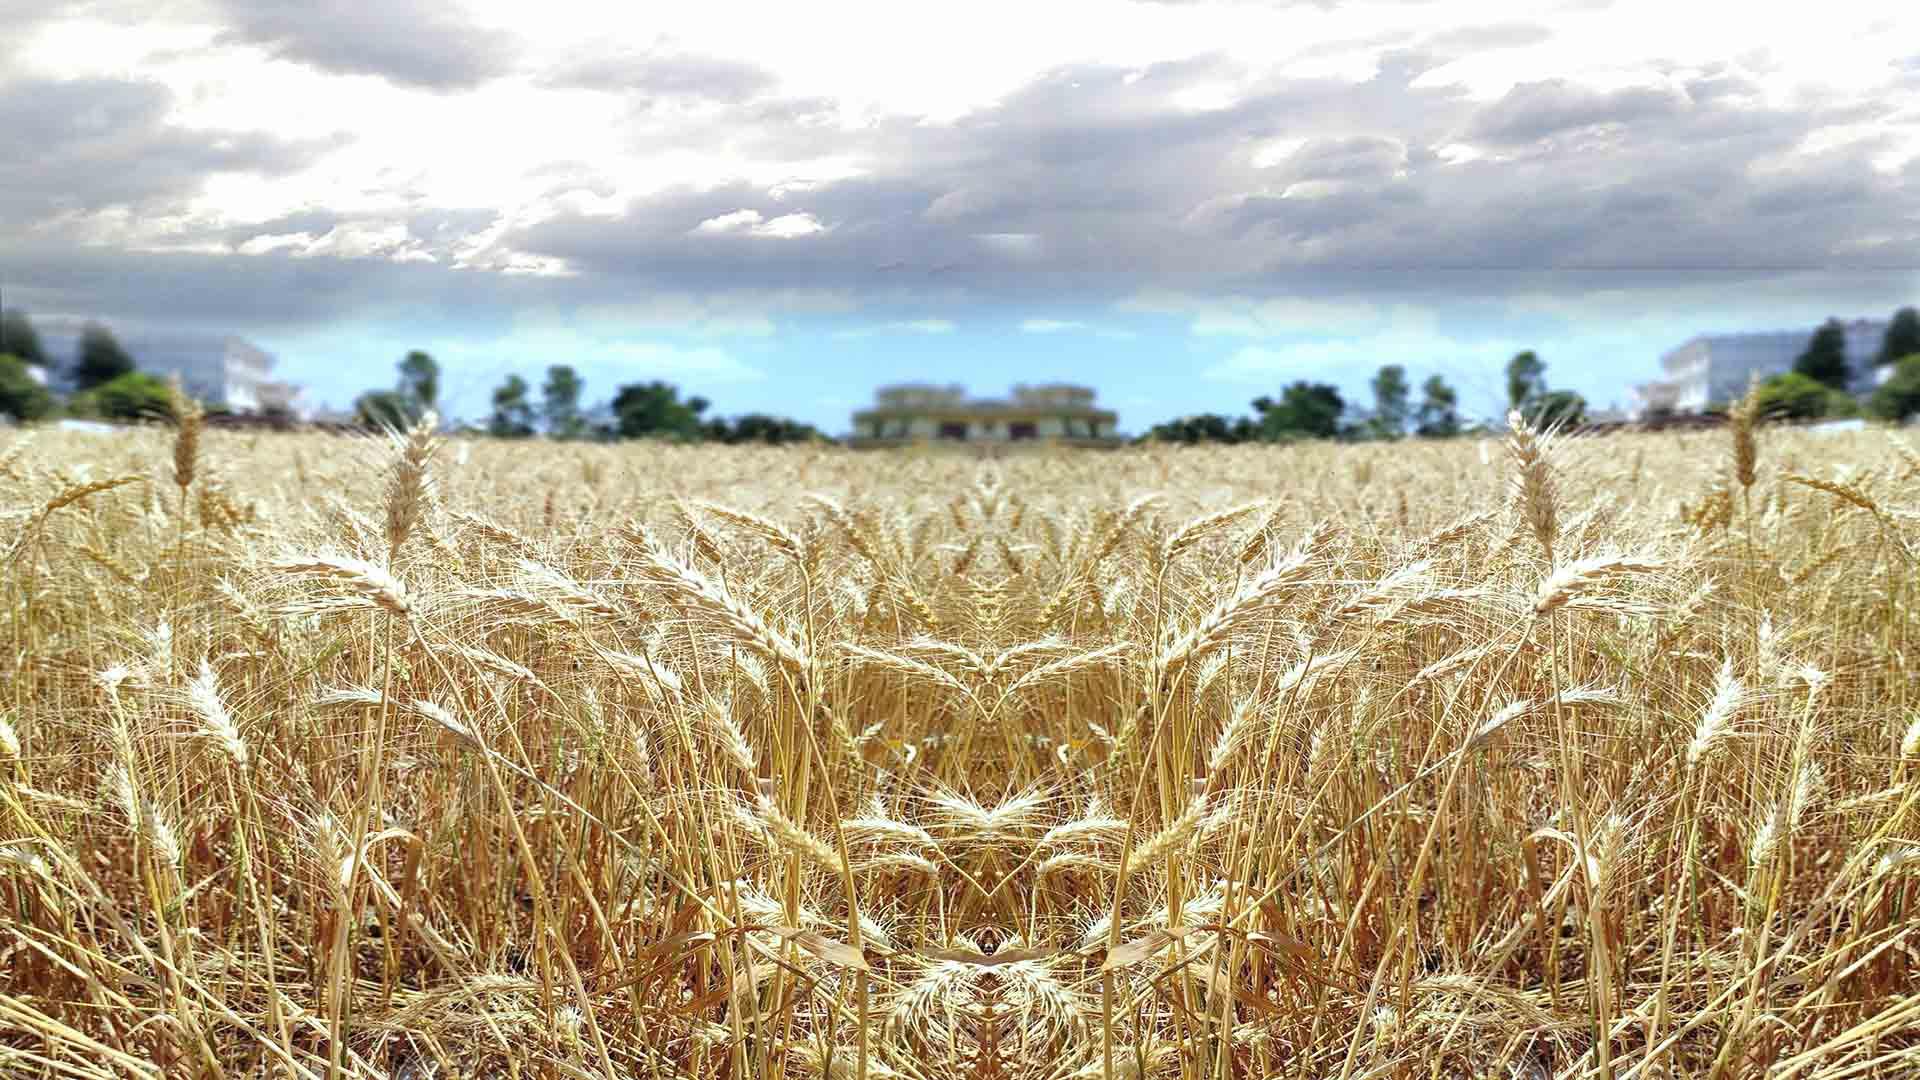 En Çok Buğday Üreten Ülkeler?fit=thumb&w=418&h=152&q=80